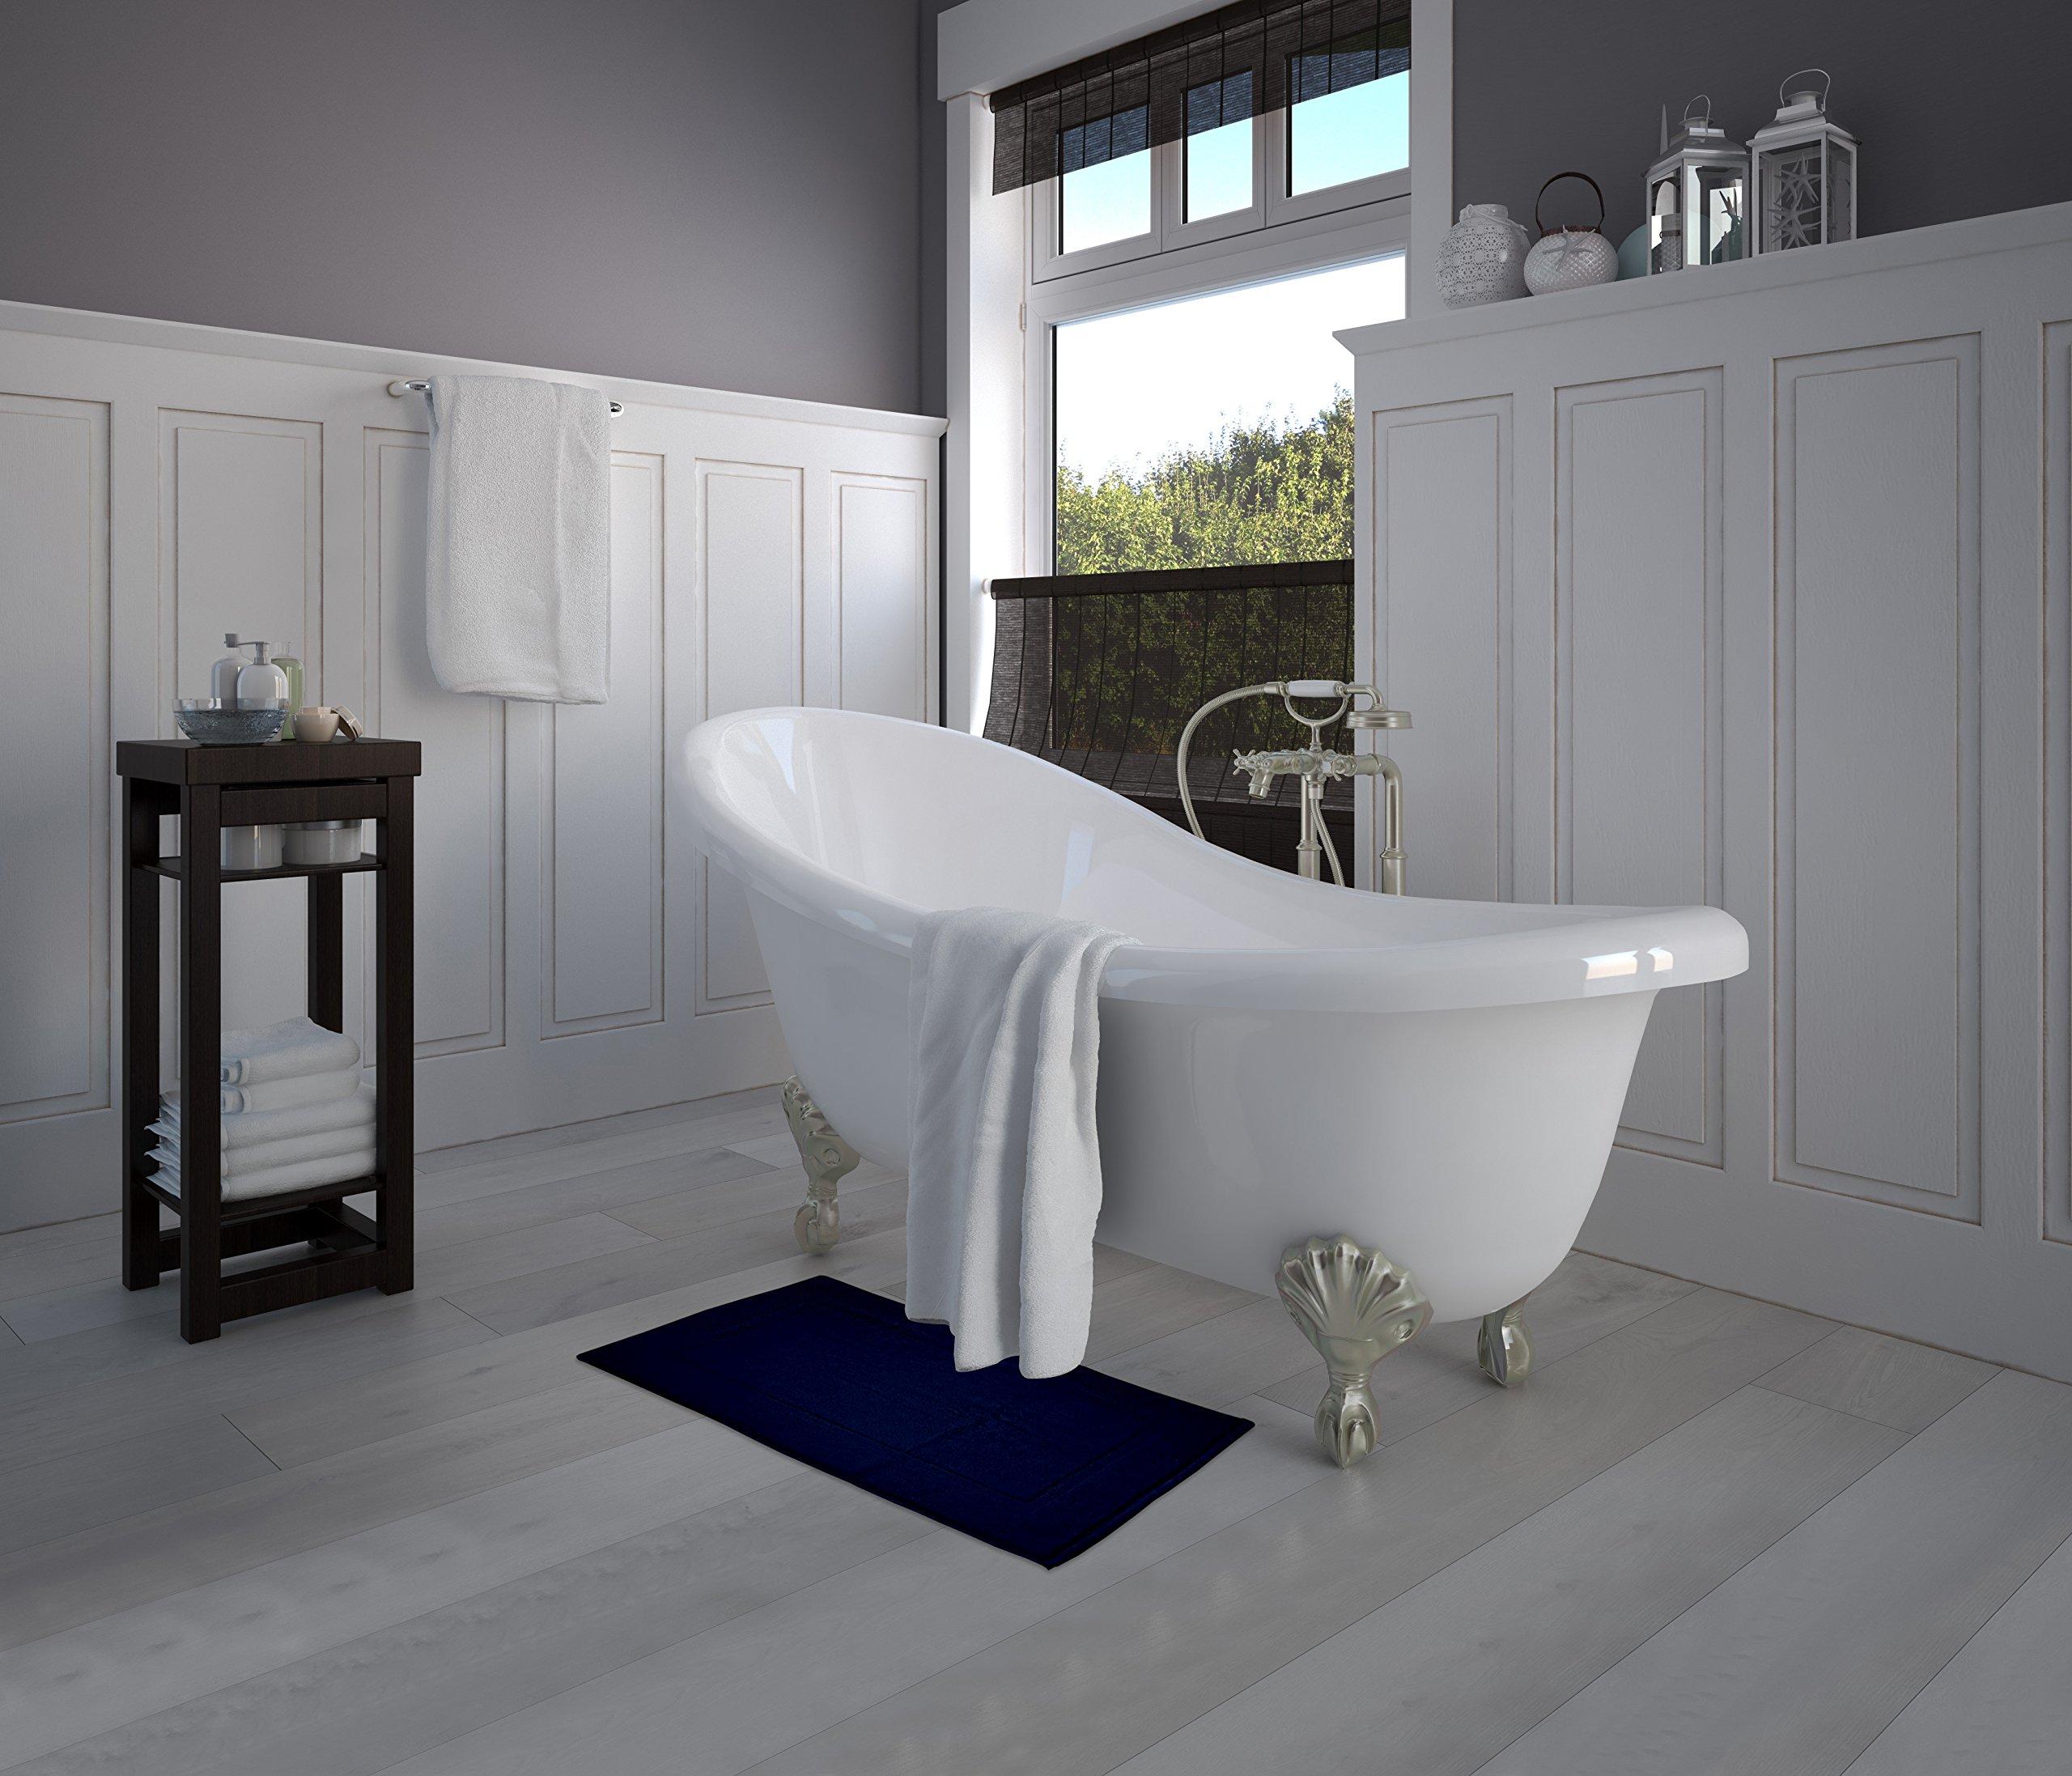 Luxury Cotton Hotel-Spa Tub-Shower Bath Mat Floor Mat - (2 Pack ...